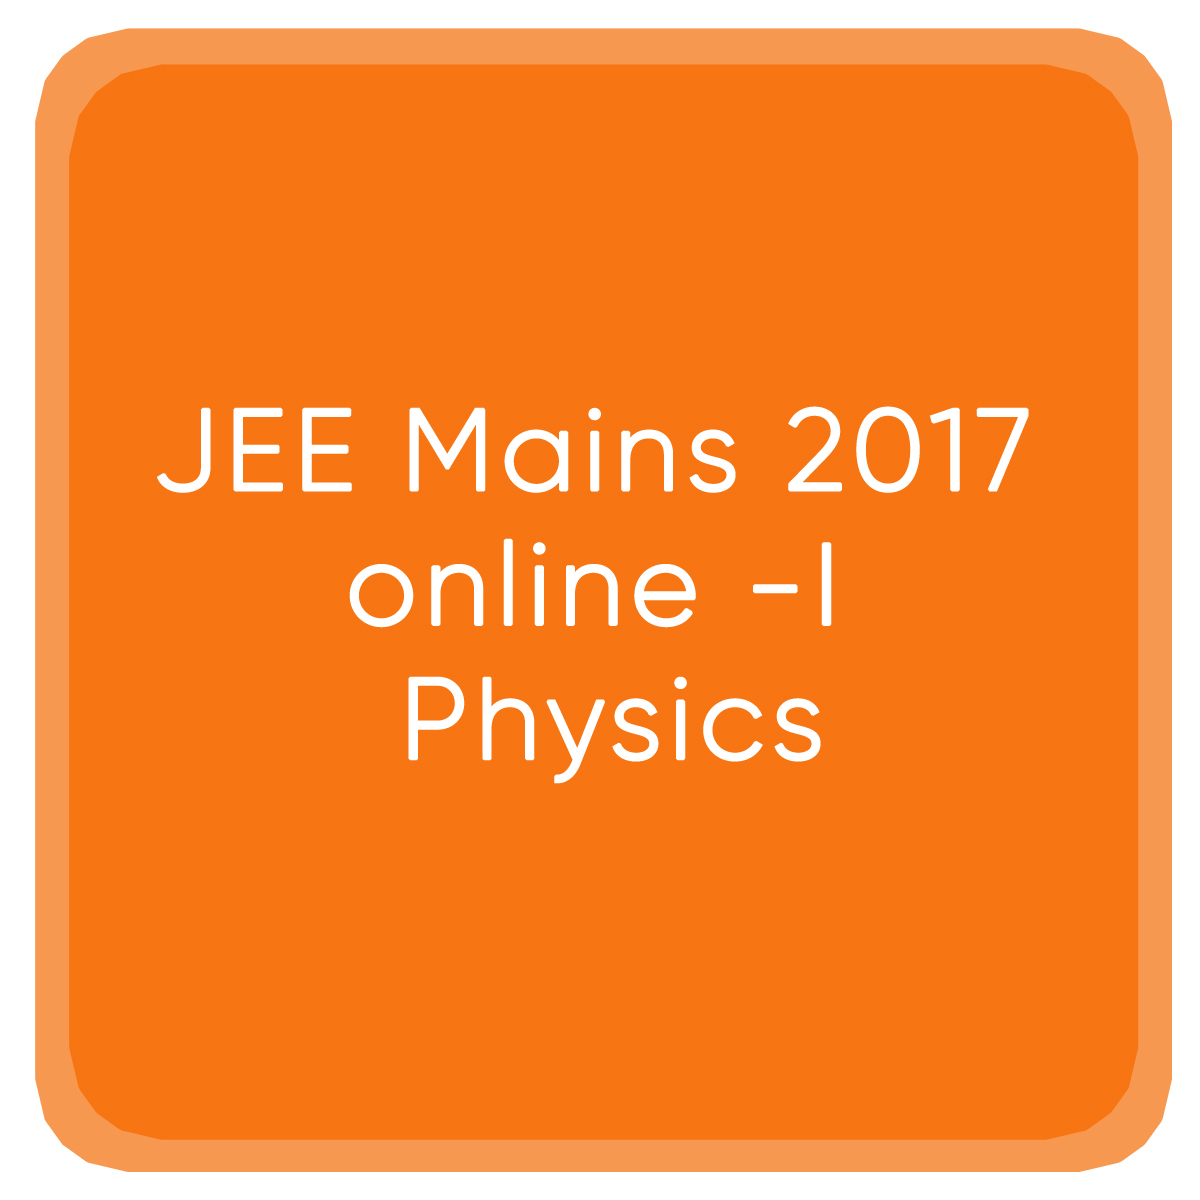 JEE Mains 2017 online -I Physics